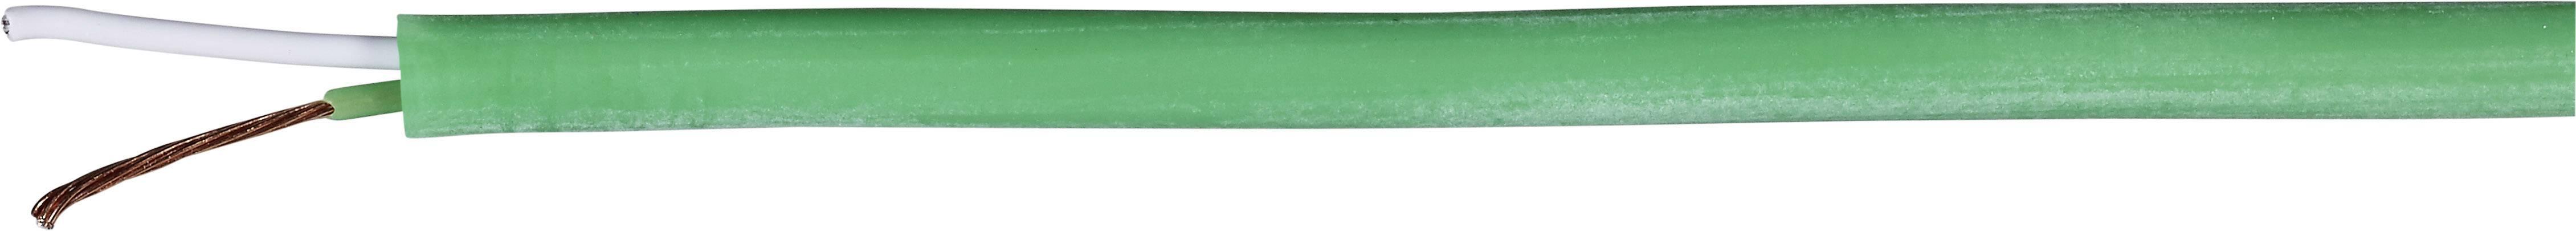 Standard-Thermoelementsteckverbinder 1 mm² 0220 0078-01 Gelb B+B Thermo-Technik